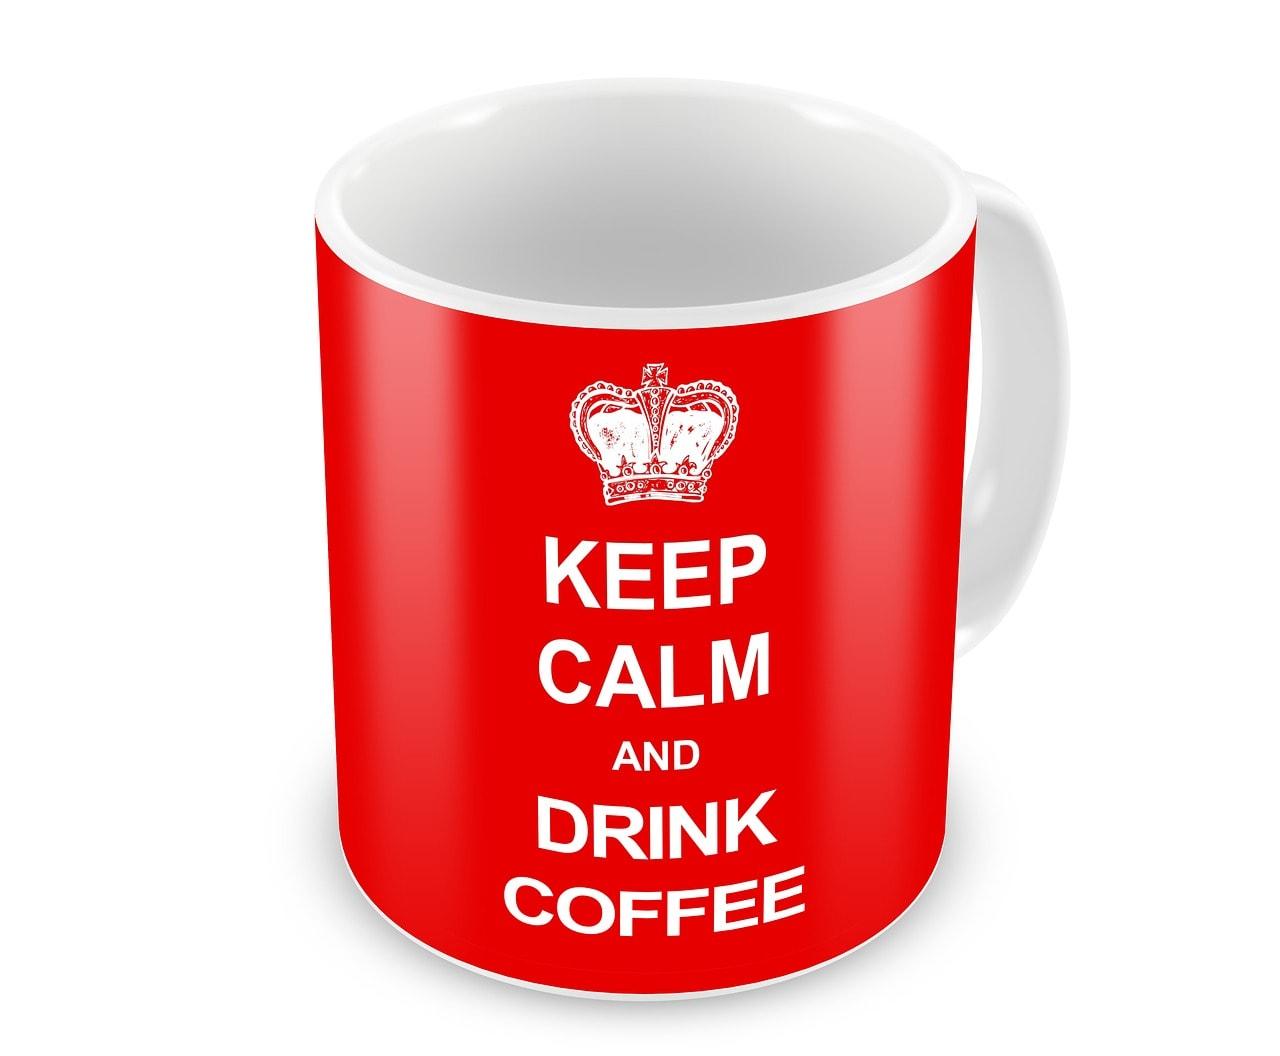 https://pixabay.com/en/keep-calm-coffee-drink-design-cup-2816357/